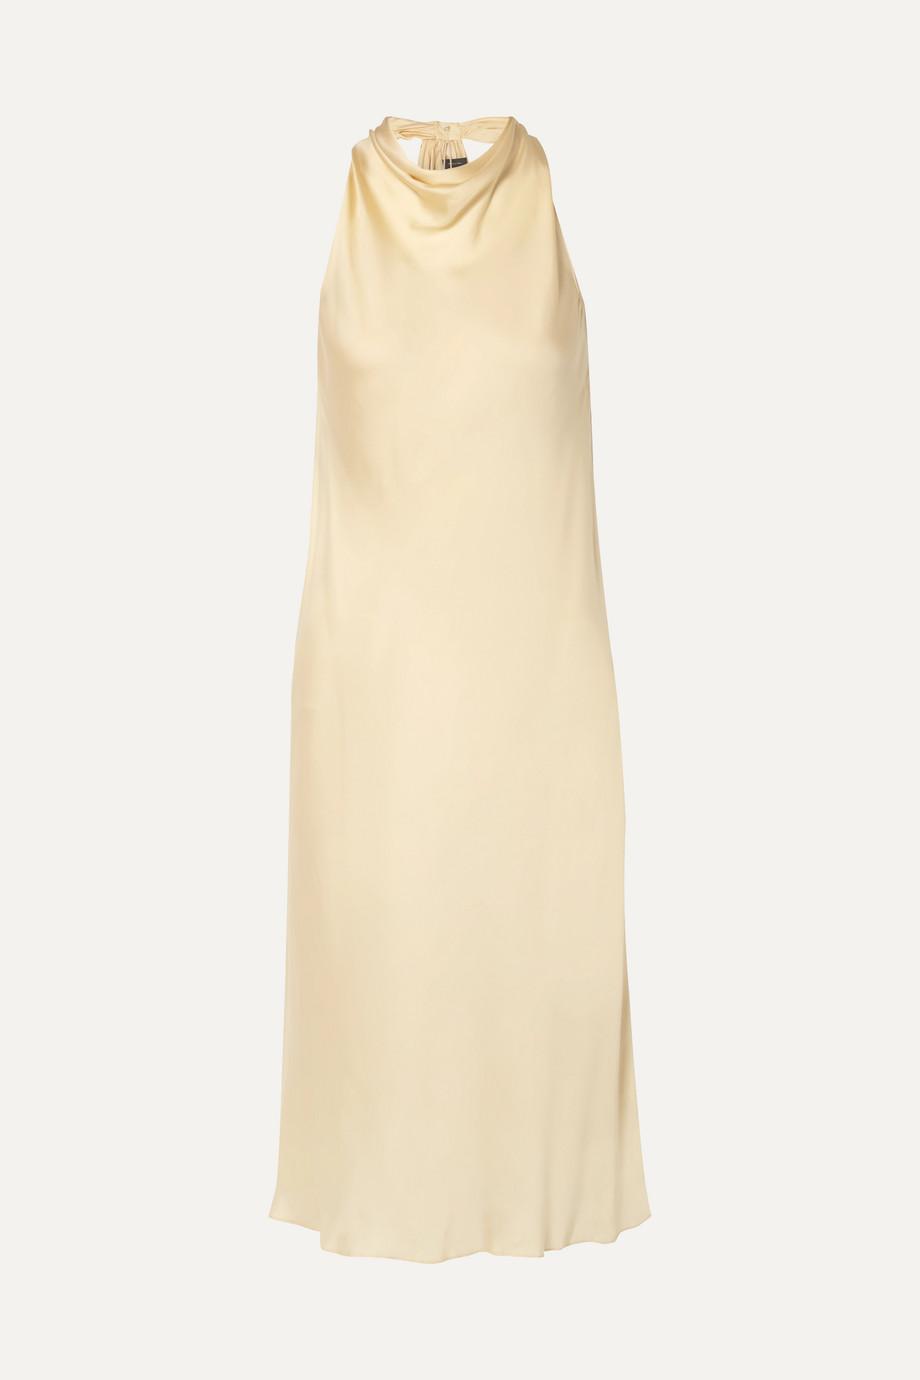 Theory Twist-back silk-charmeuse midi dress